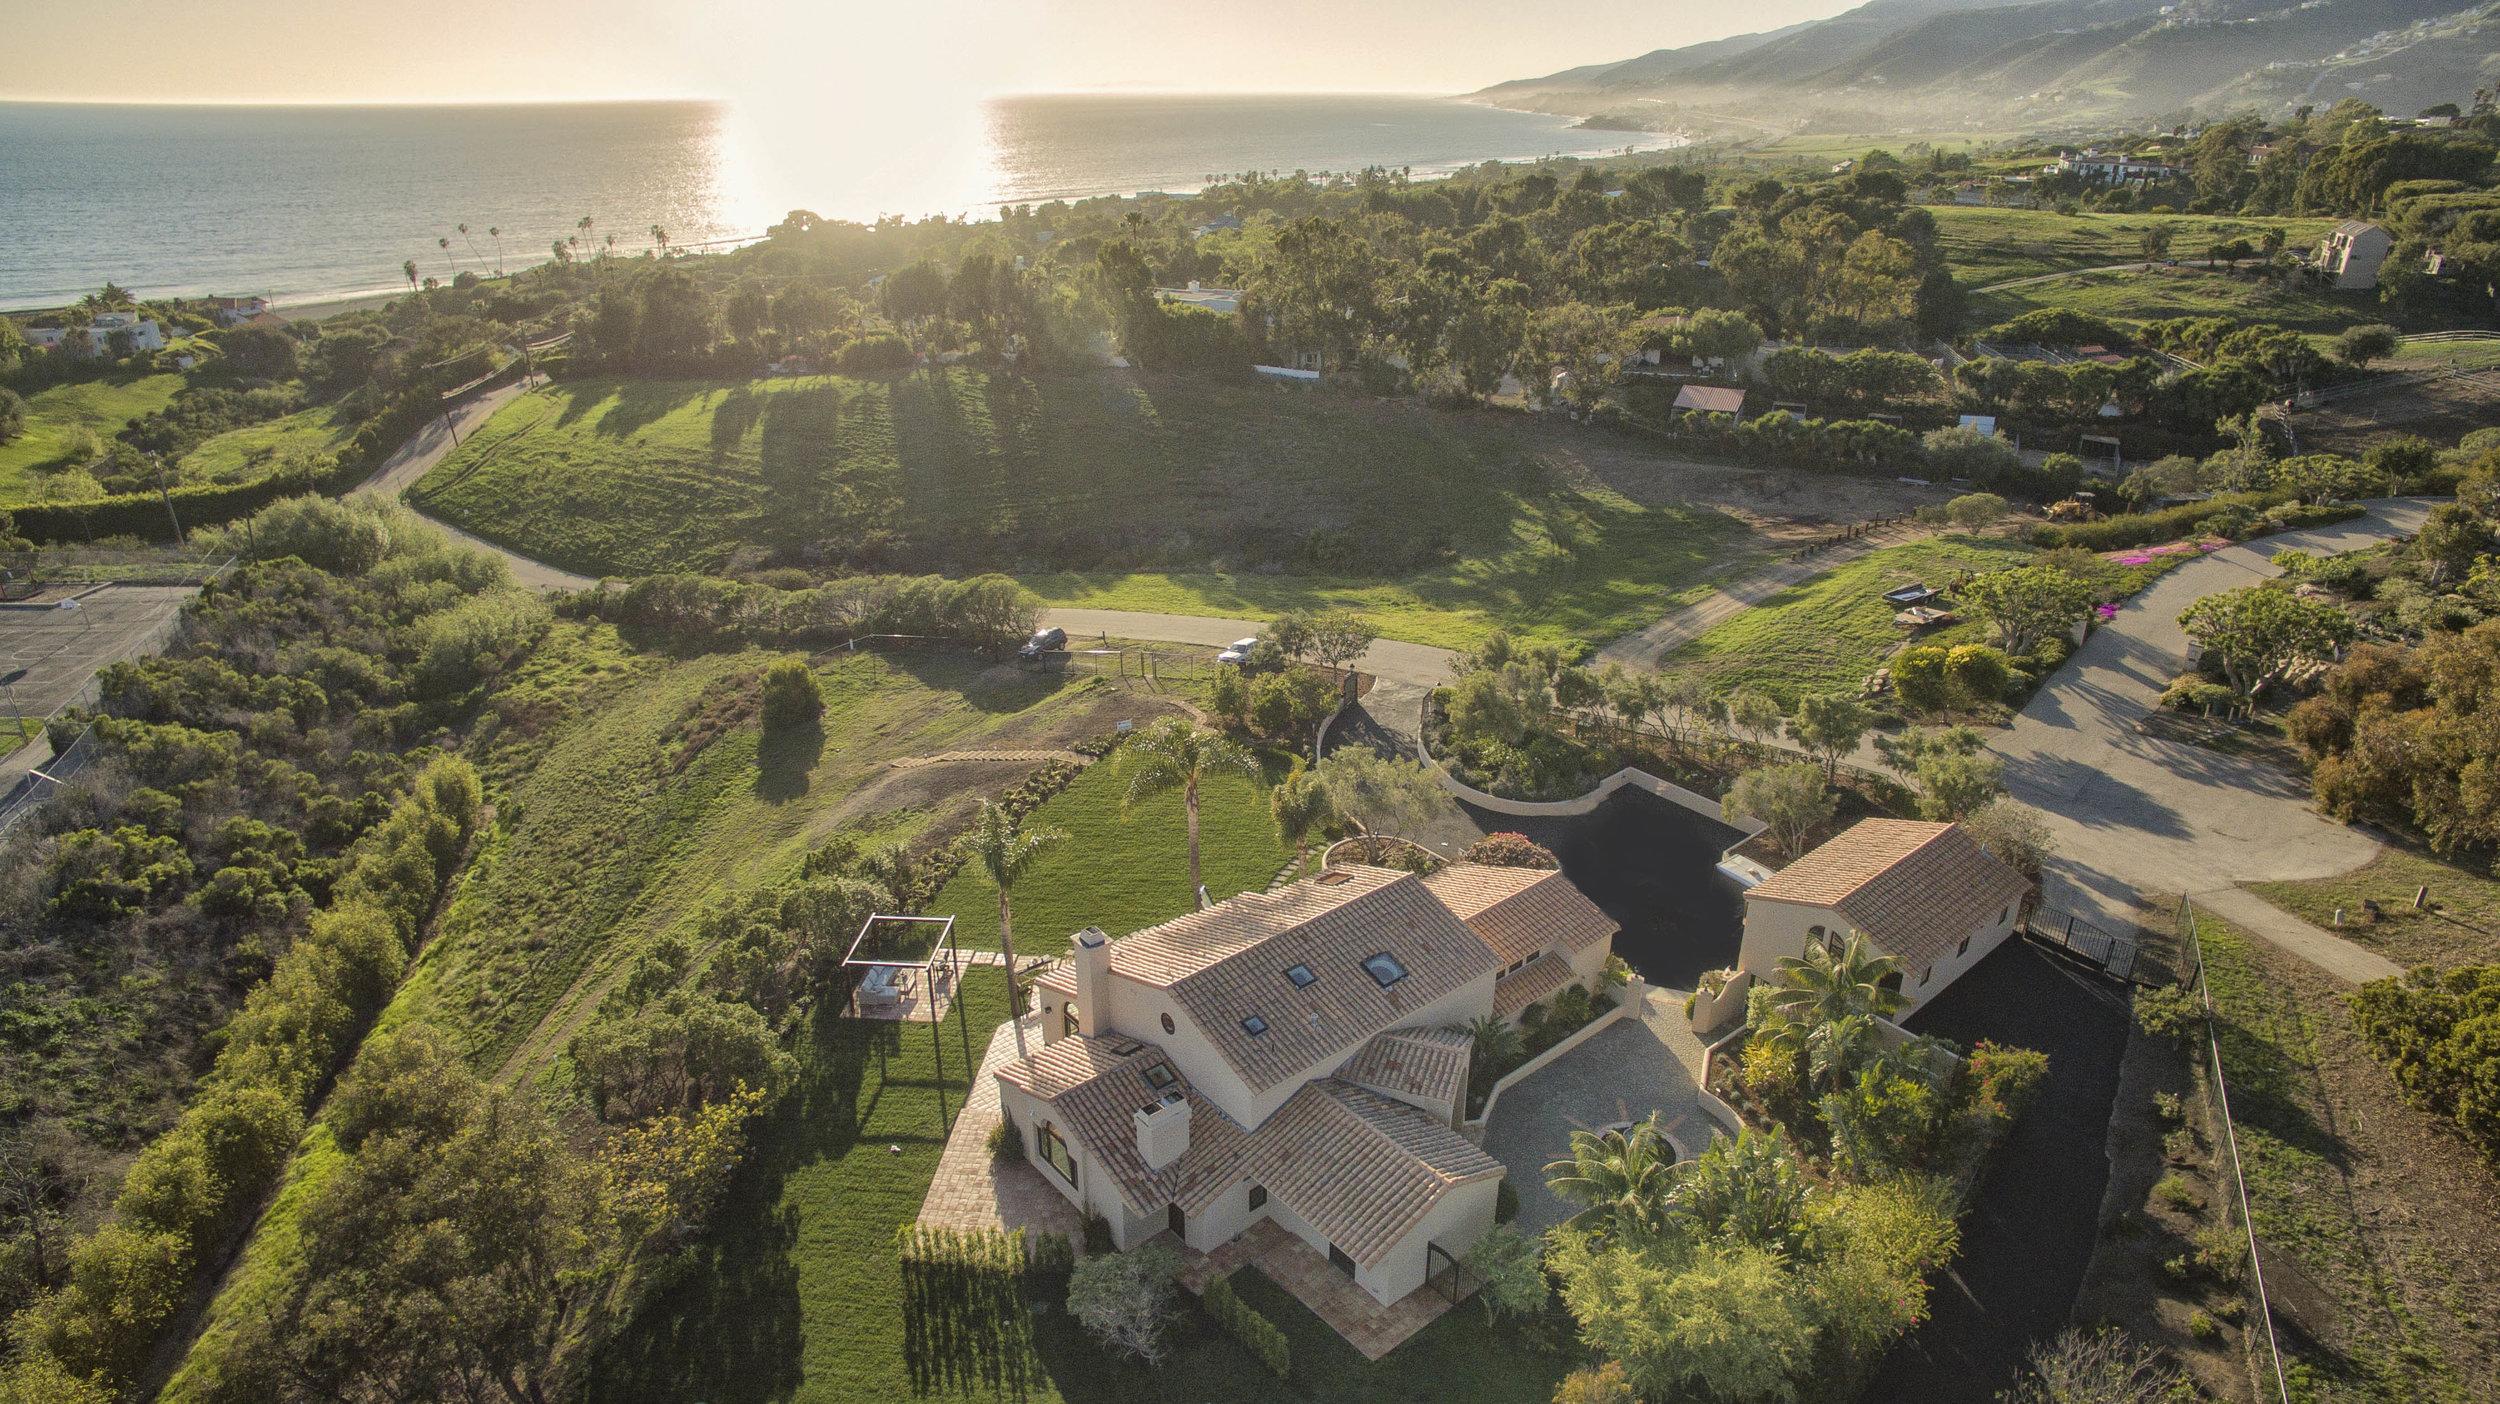 001 6130 Via Cabrillo For Sale Lease The Malibu Life Team Luxury Real Estate.jpg